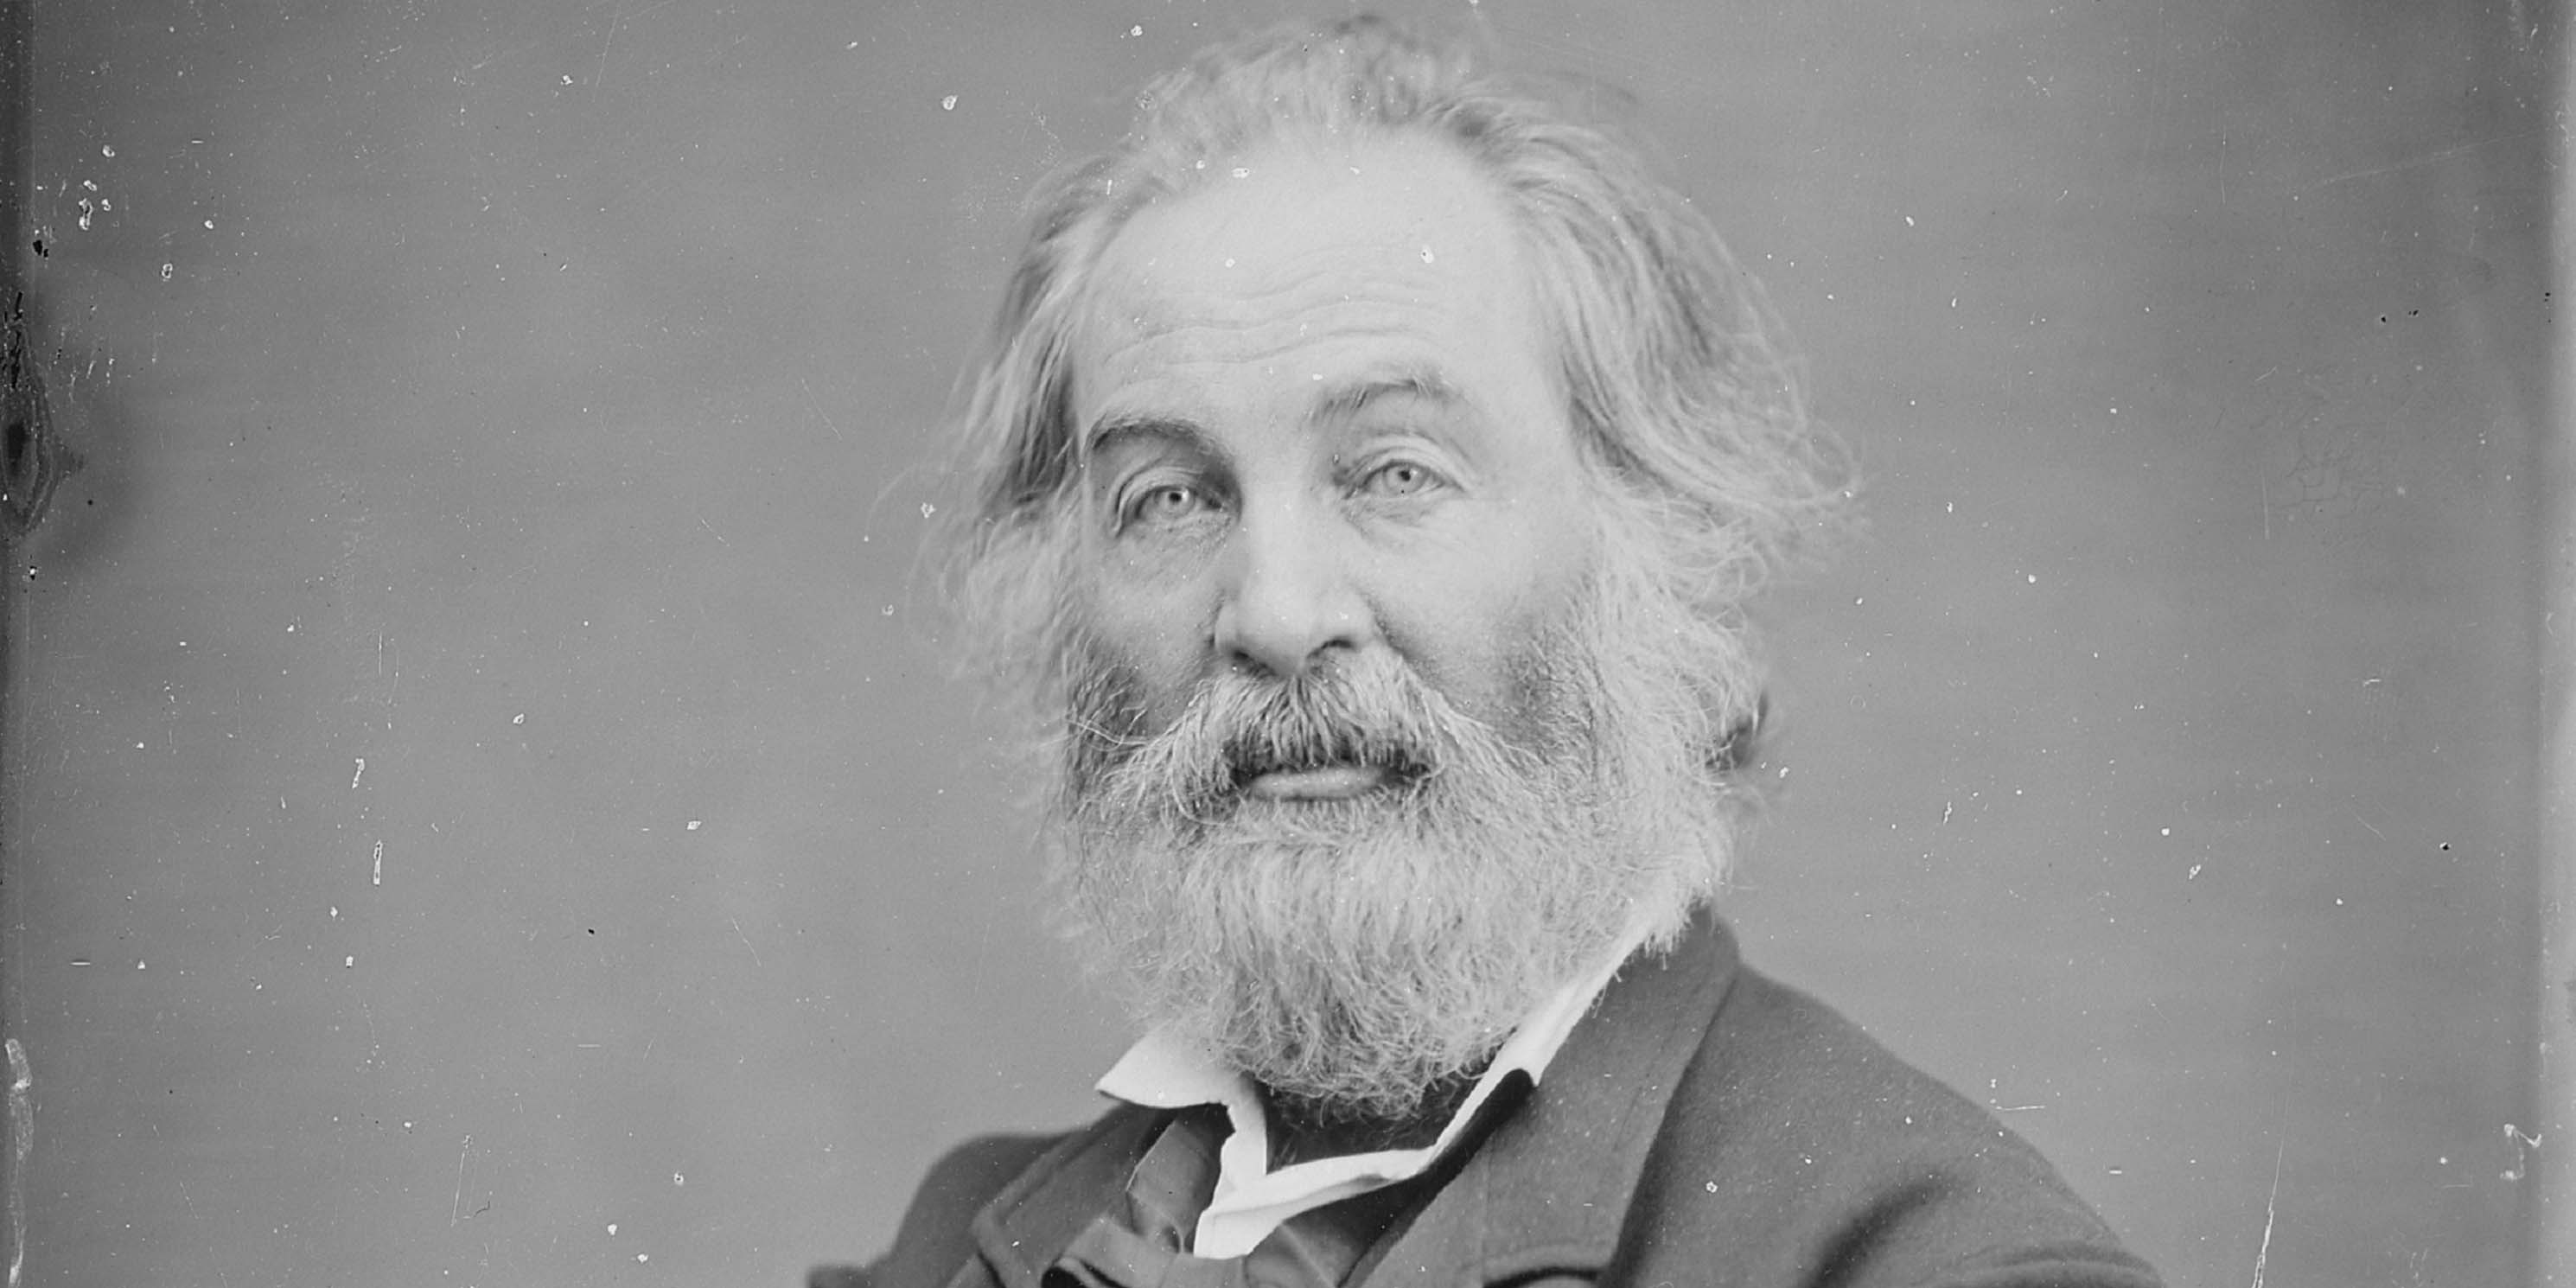 Portrait of Walt Whitman by Matthew Brady